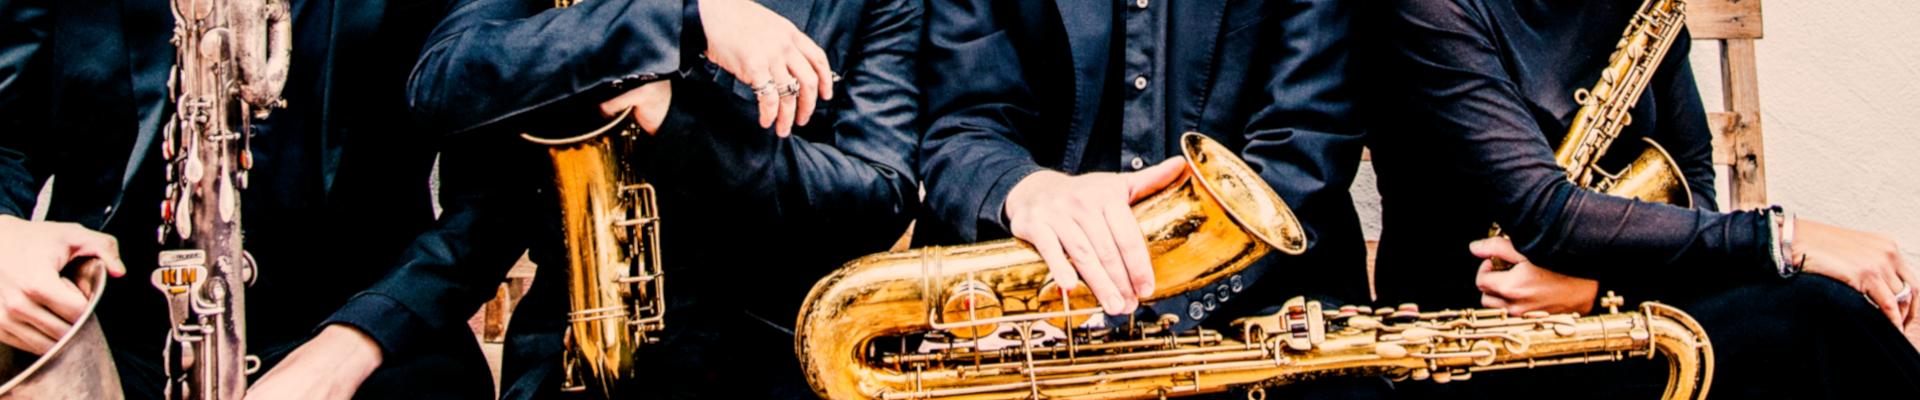 Raschèr-Saxophone-Quartets_Dozenten